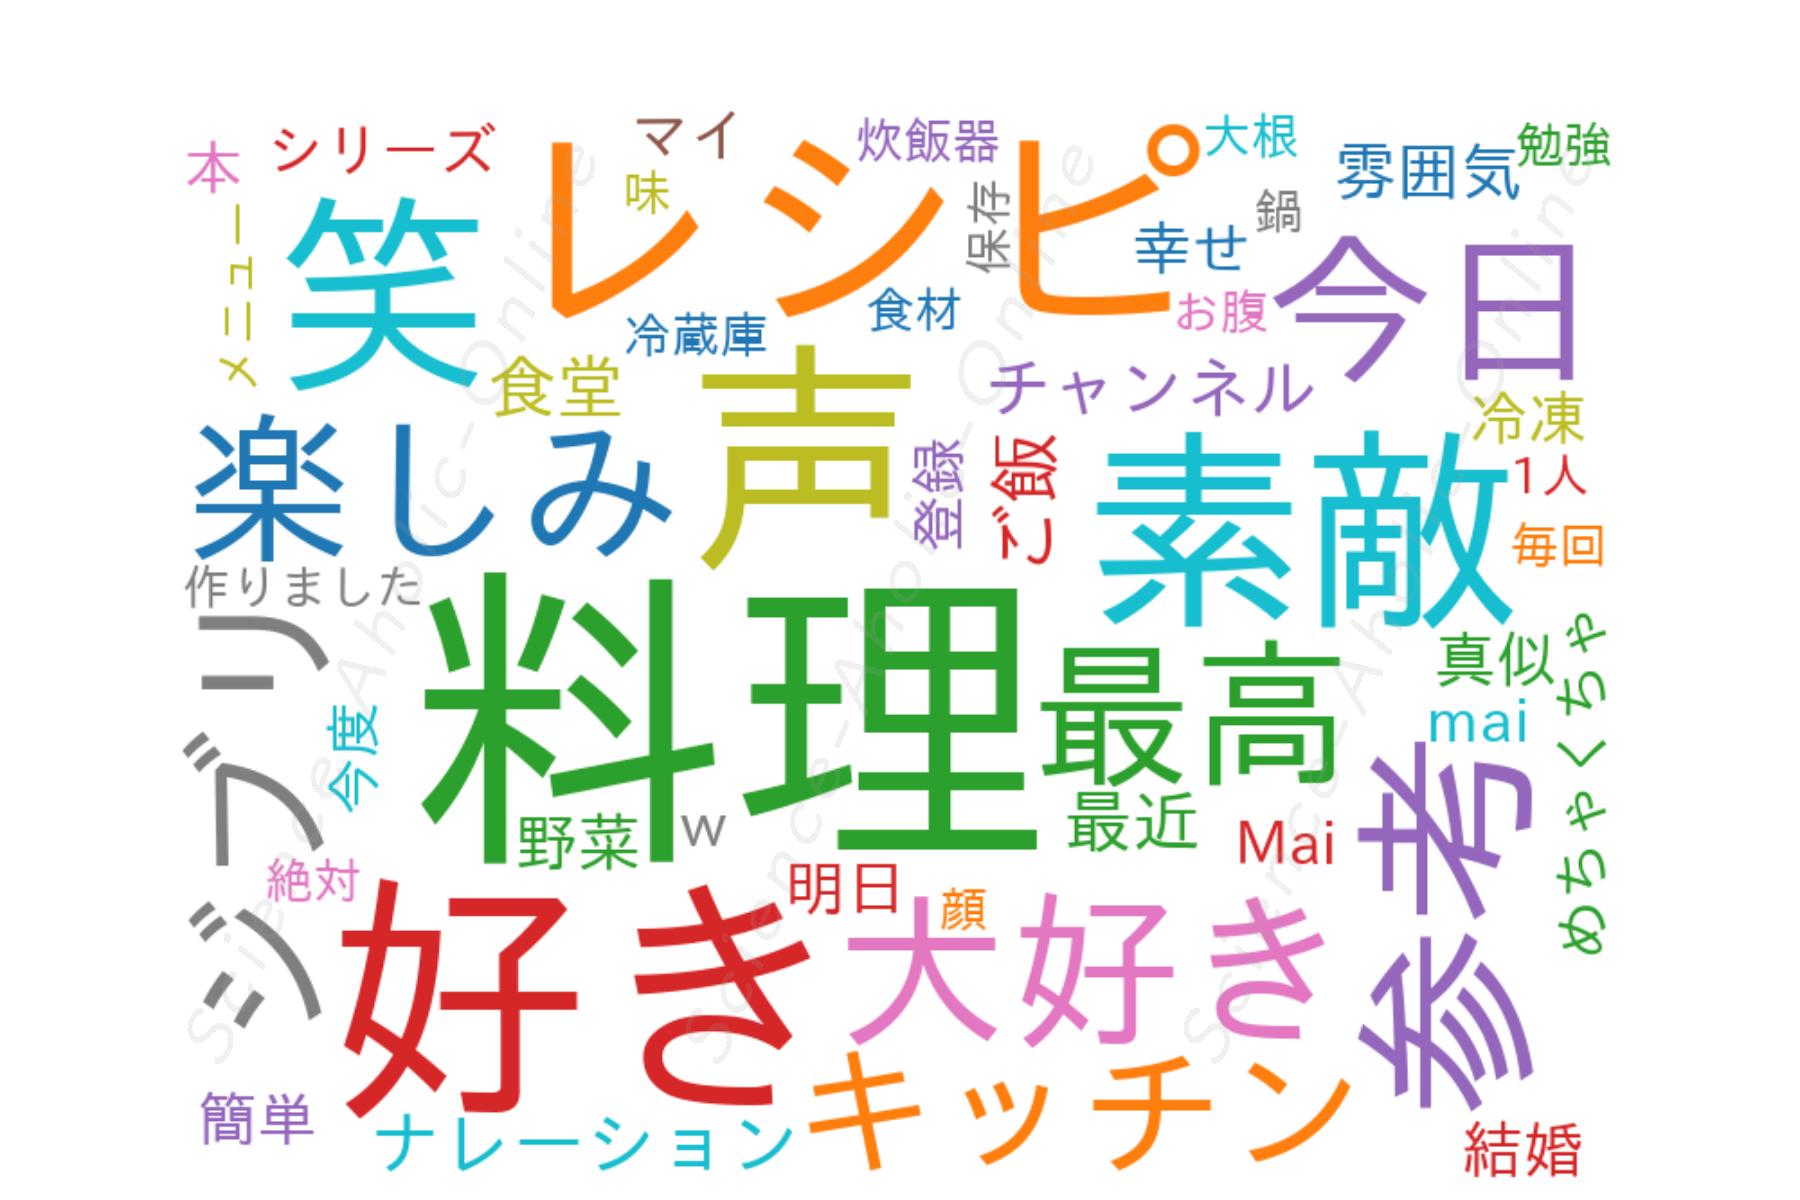 https://science-aholic-online.com/wp-content/uploads/2020/08/wordcloud_1人前食堂.png